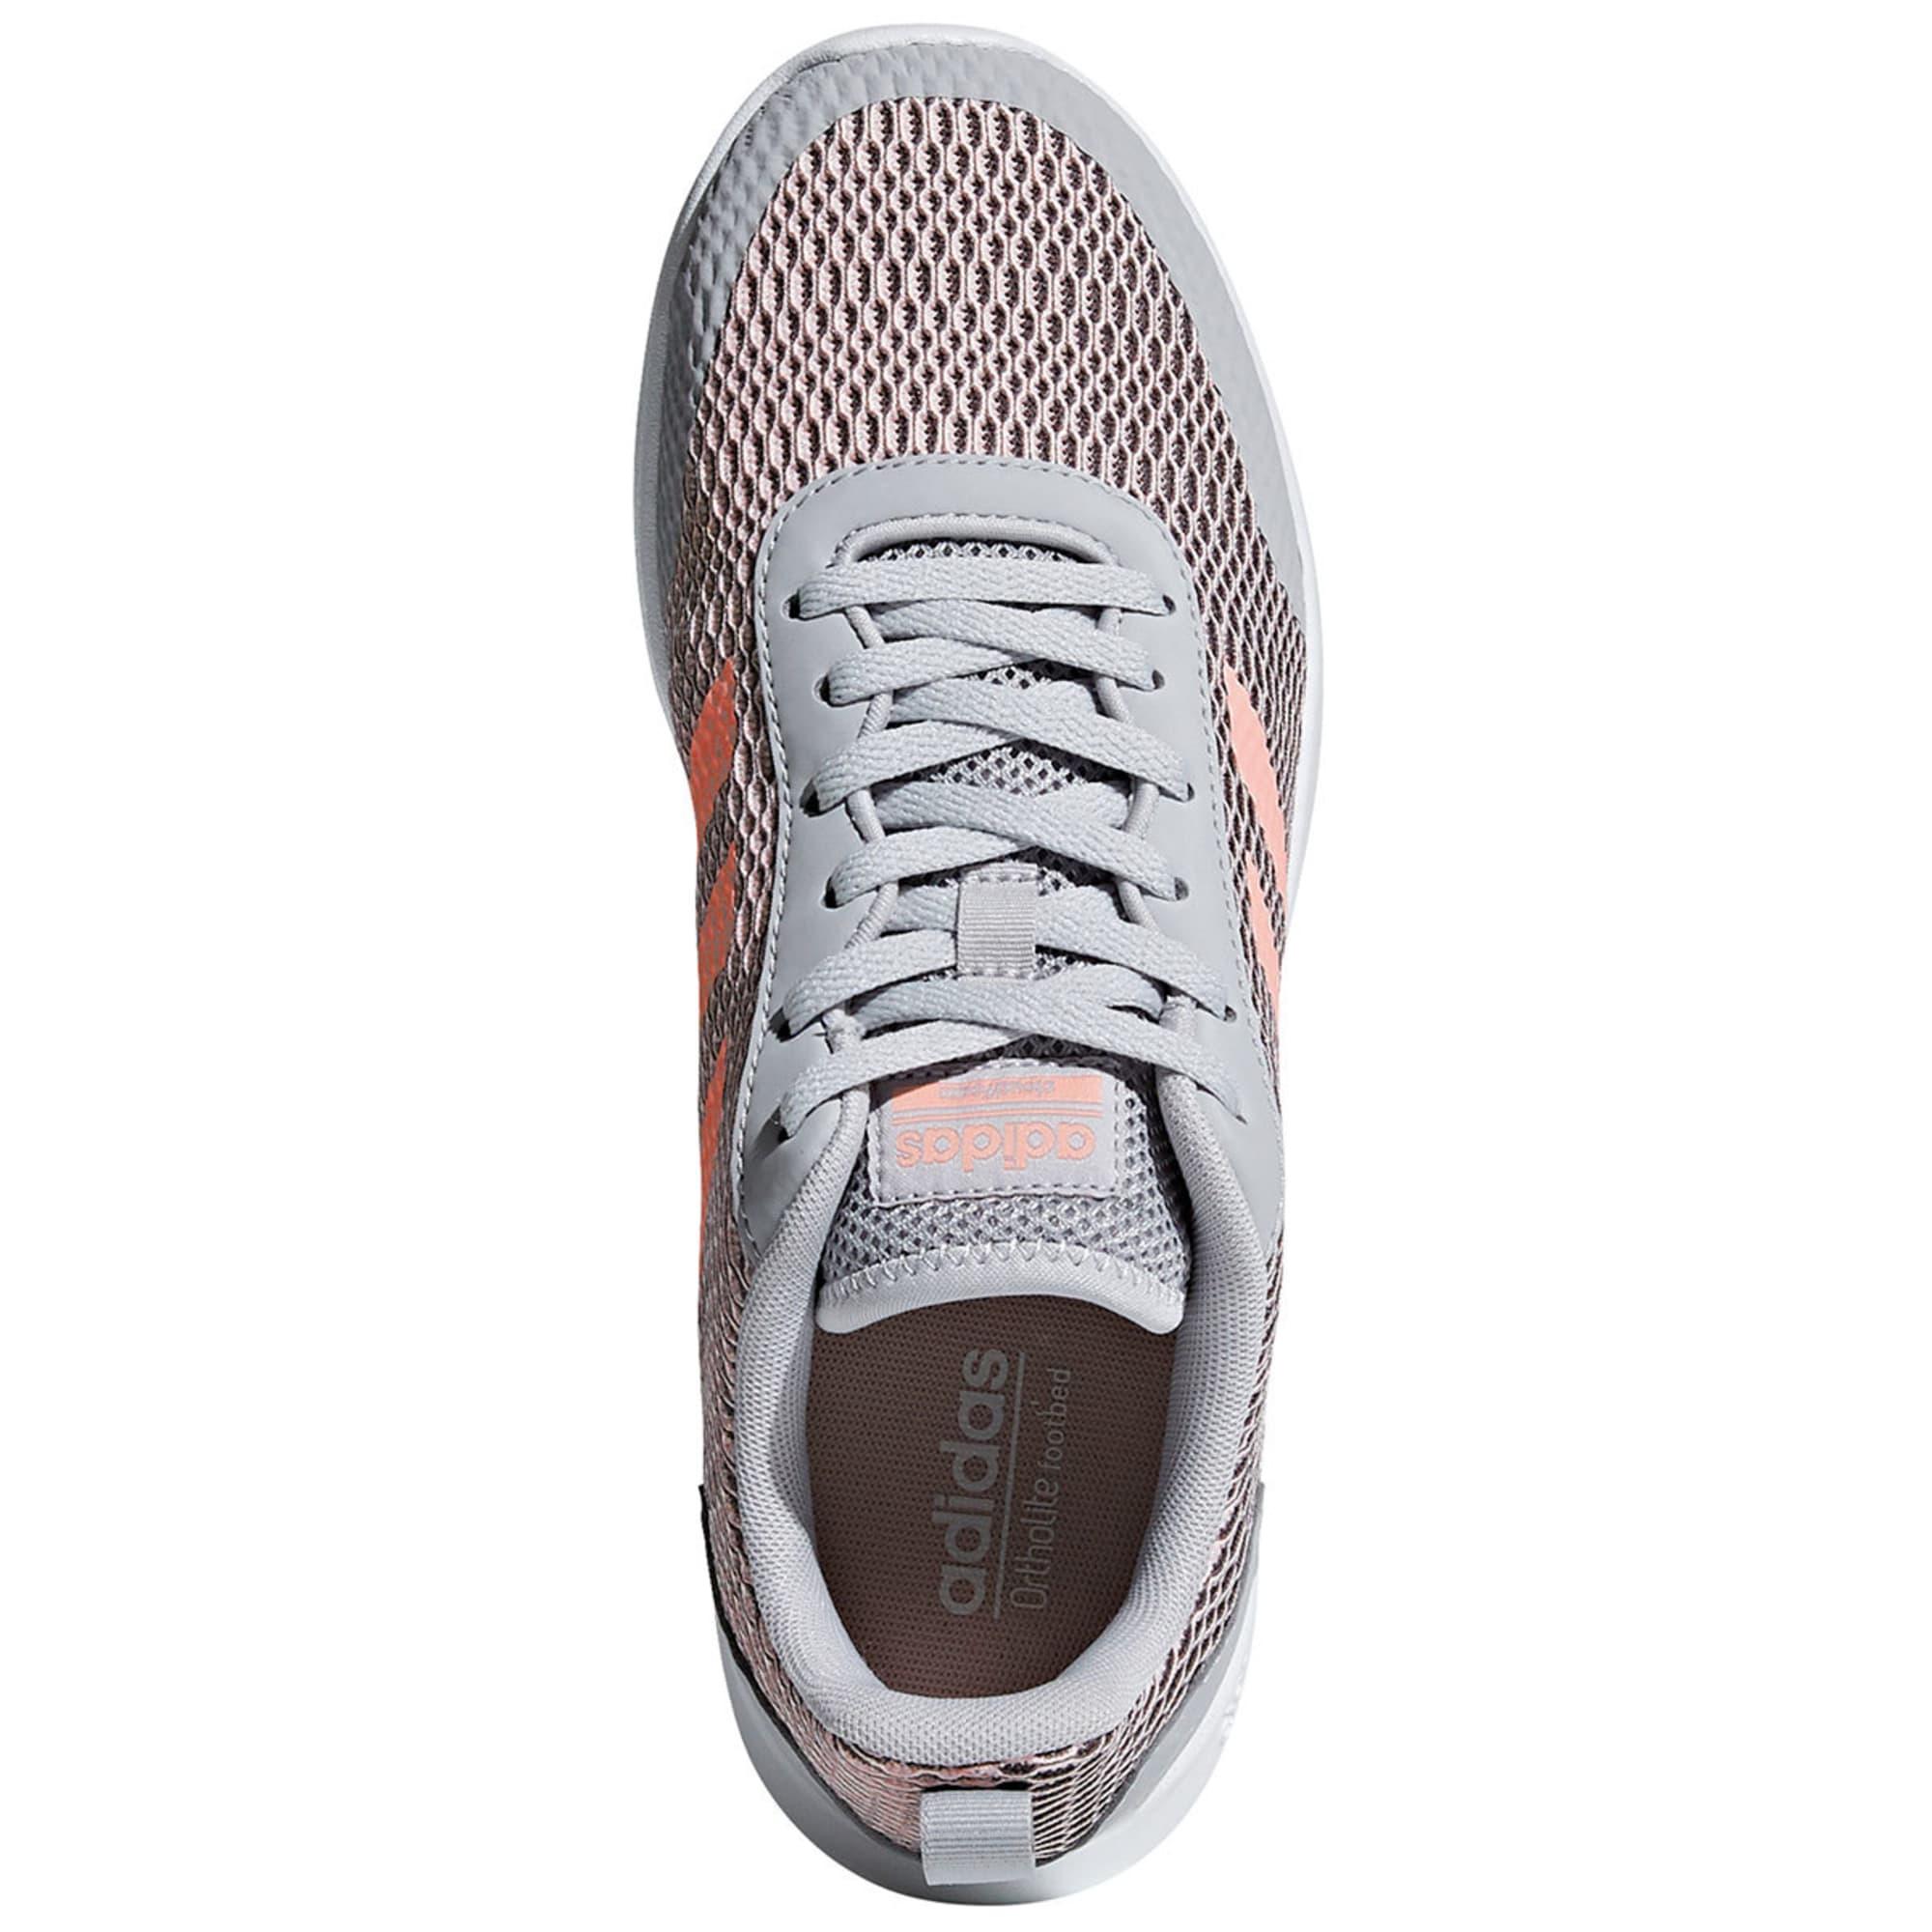 Cloudfoam Element Race Running Shoes